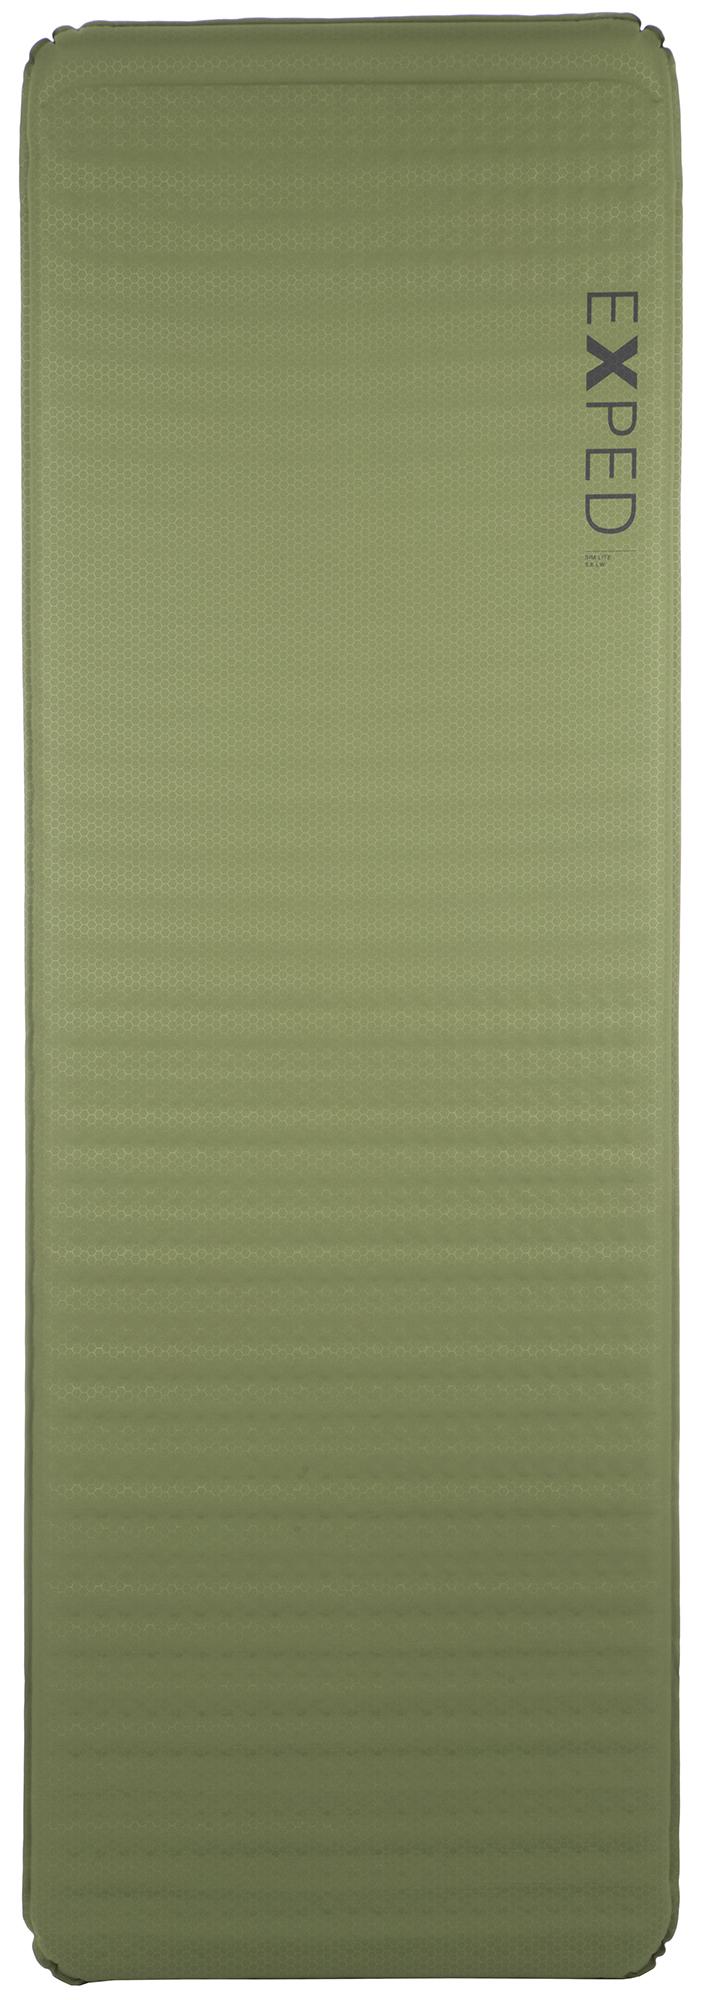 коврик norfin коврик самонадувающийся atlantic comfort nf 5 0см Exped Коврик самонадувающийся Exped SIM Lite 3.8 LW, 197 см